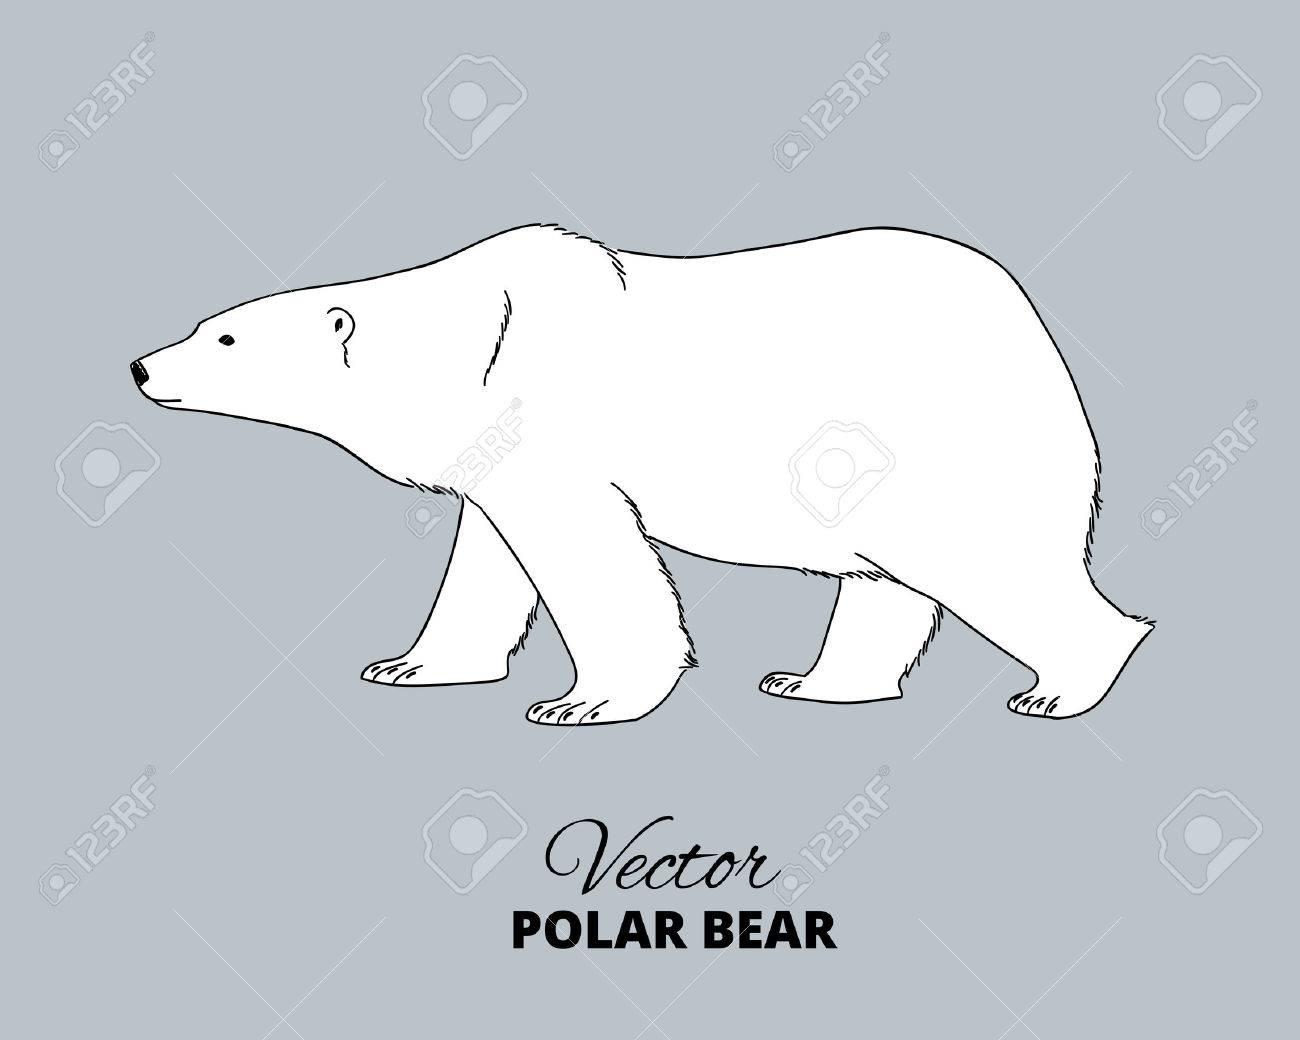 polar bear hand drawn illustration walking or stranding polar